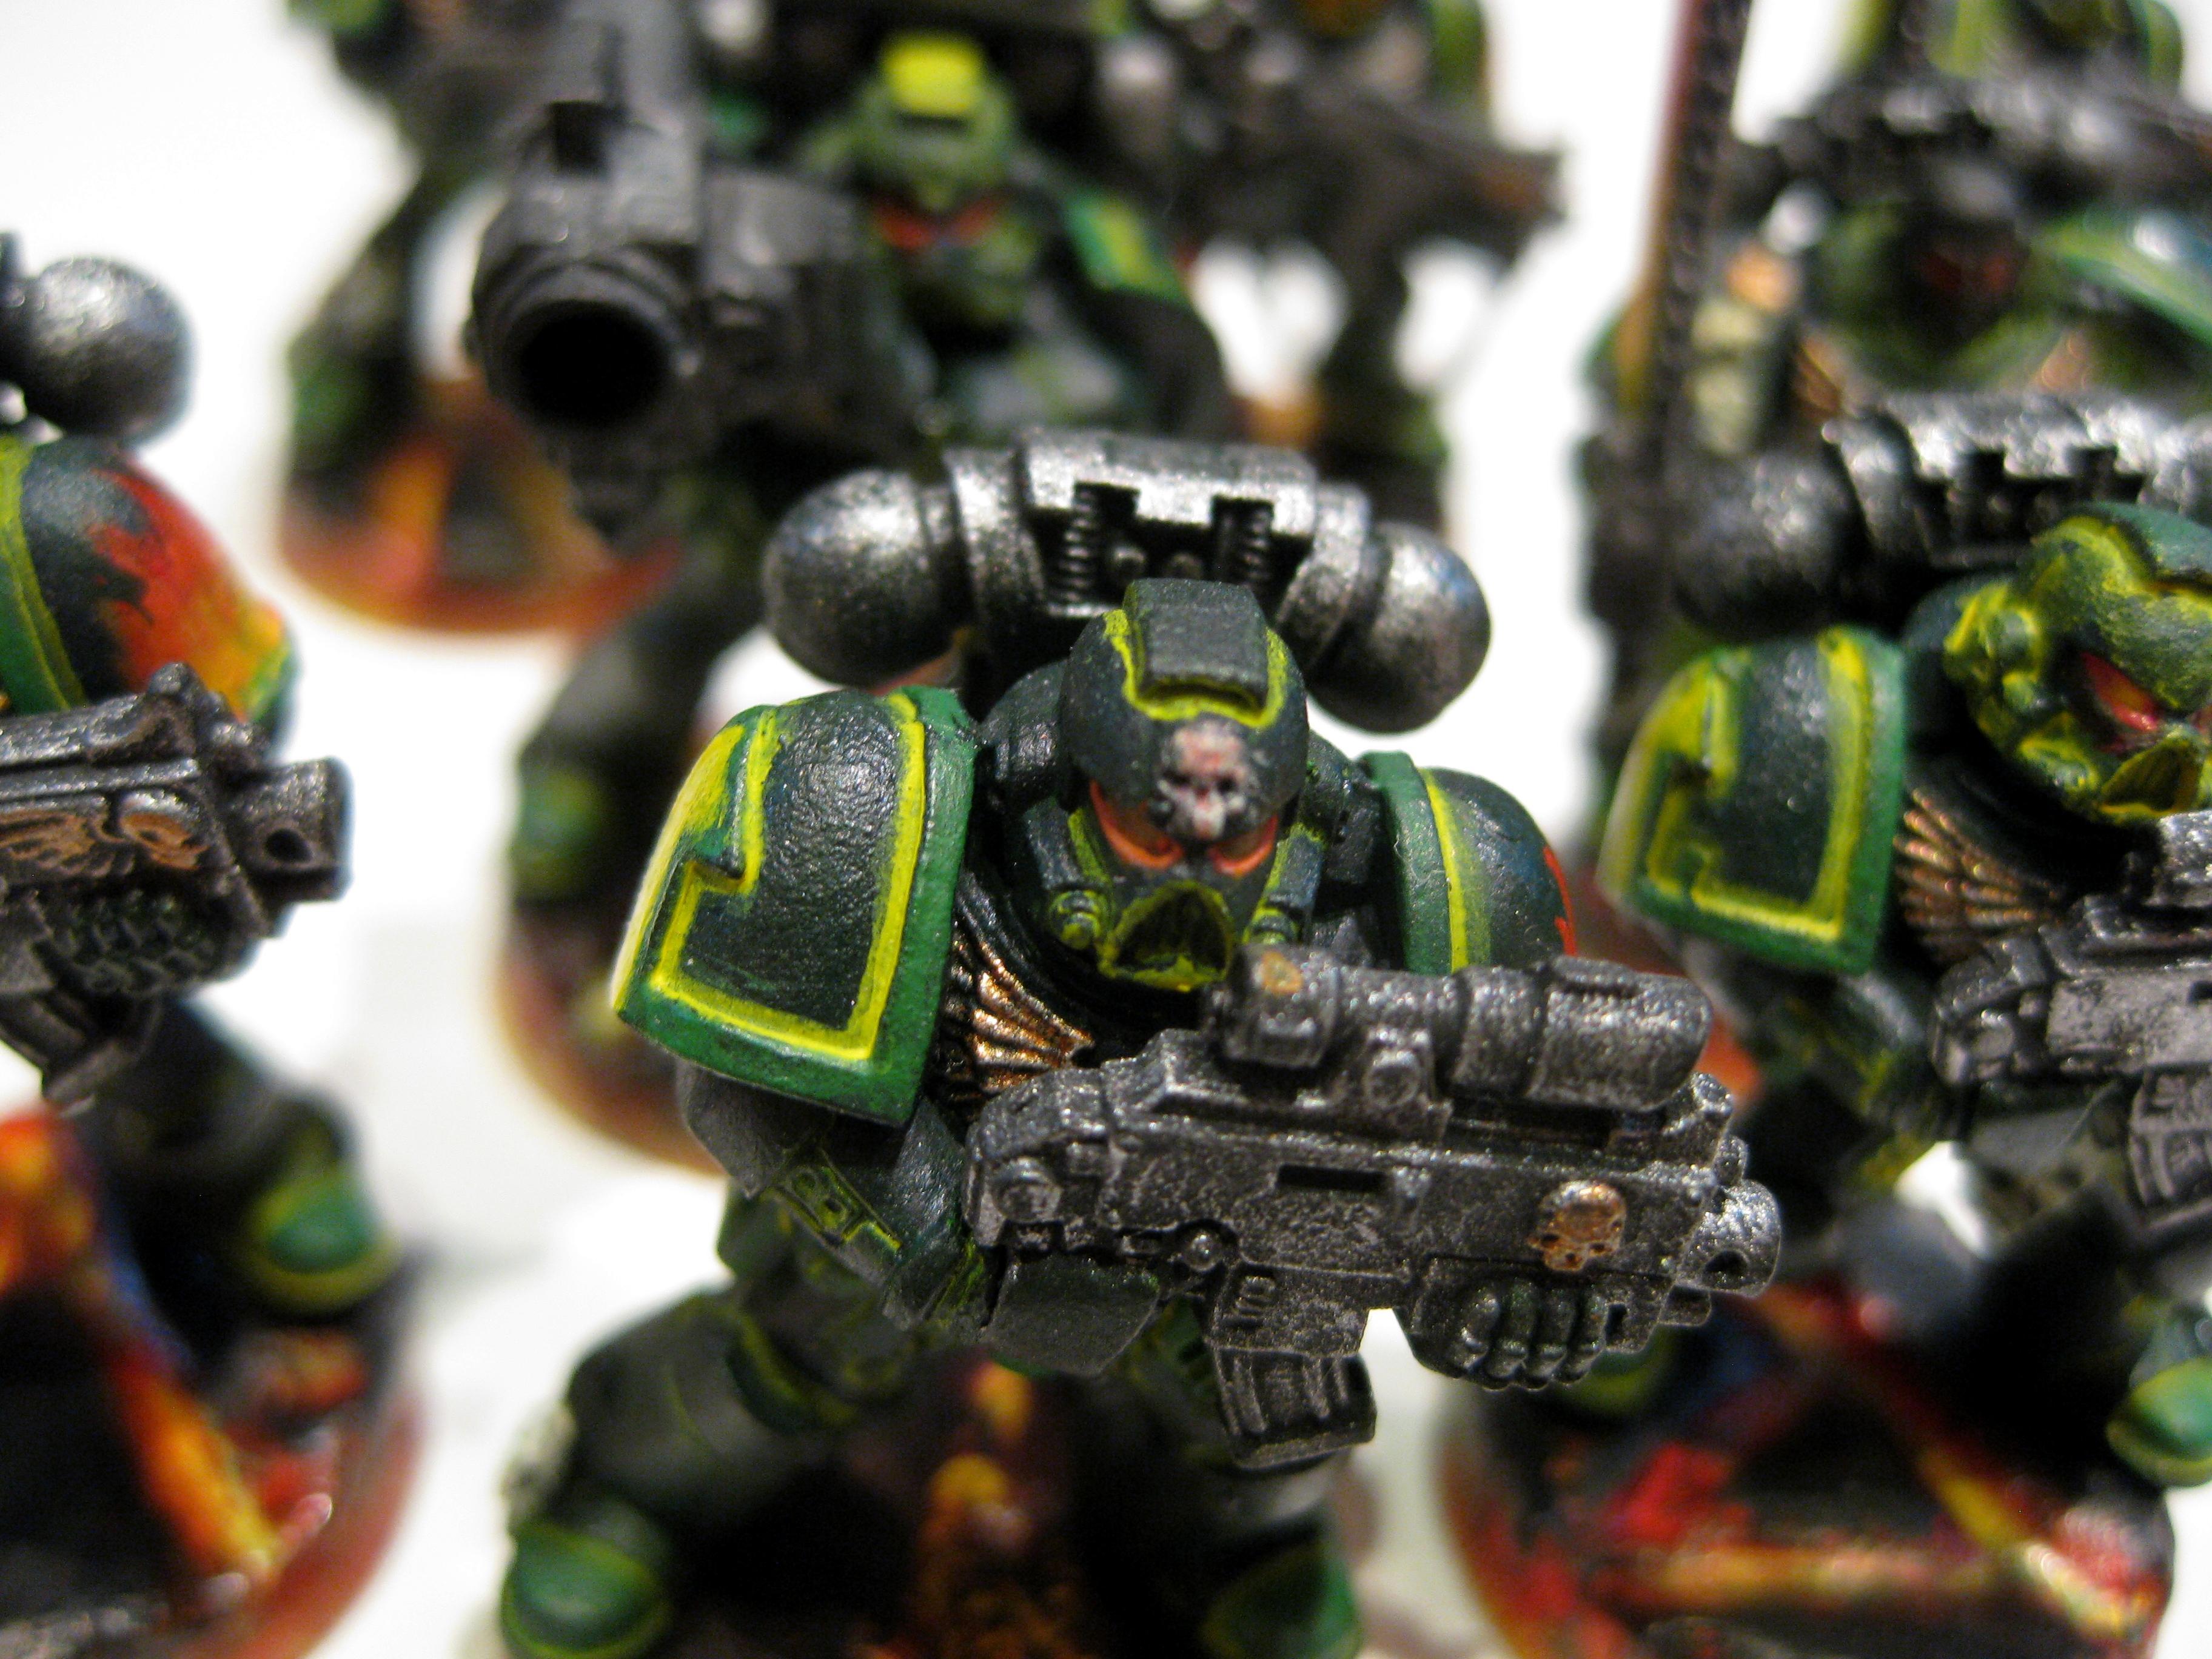 LED, Light, Salamander, Space, Space Marines, Warhammer 40,000